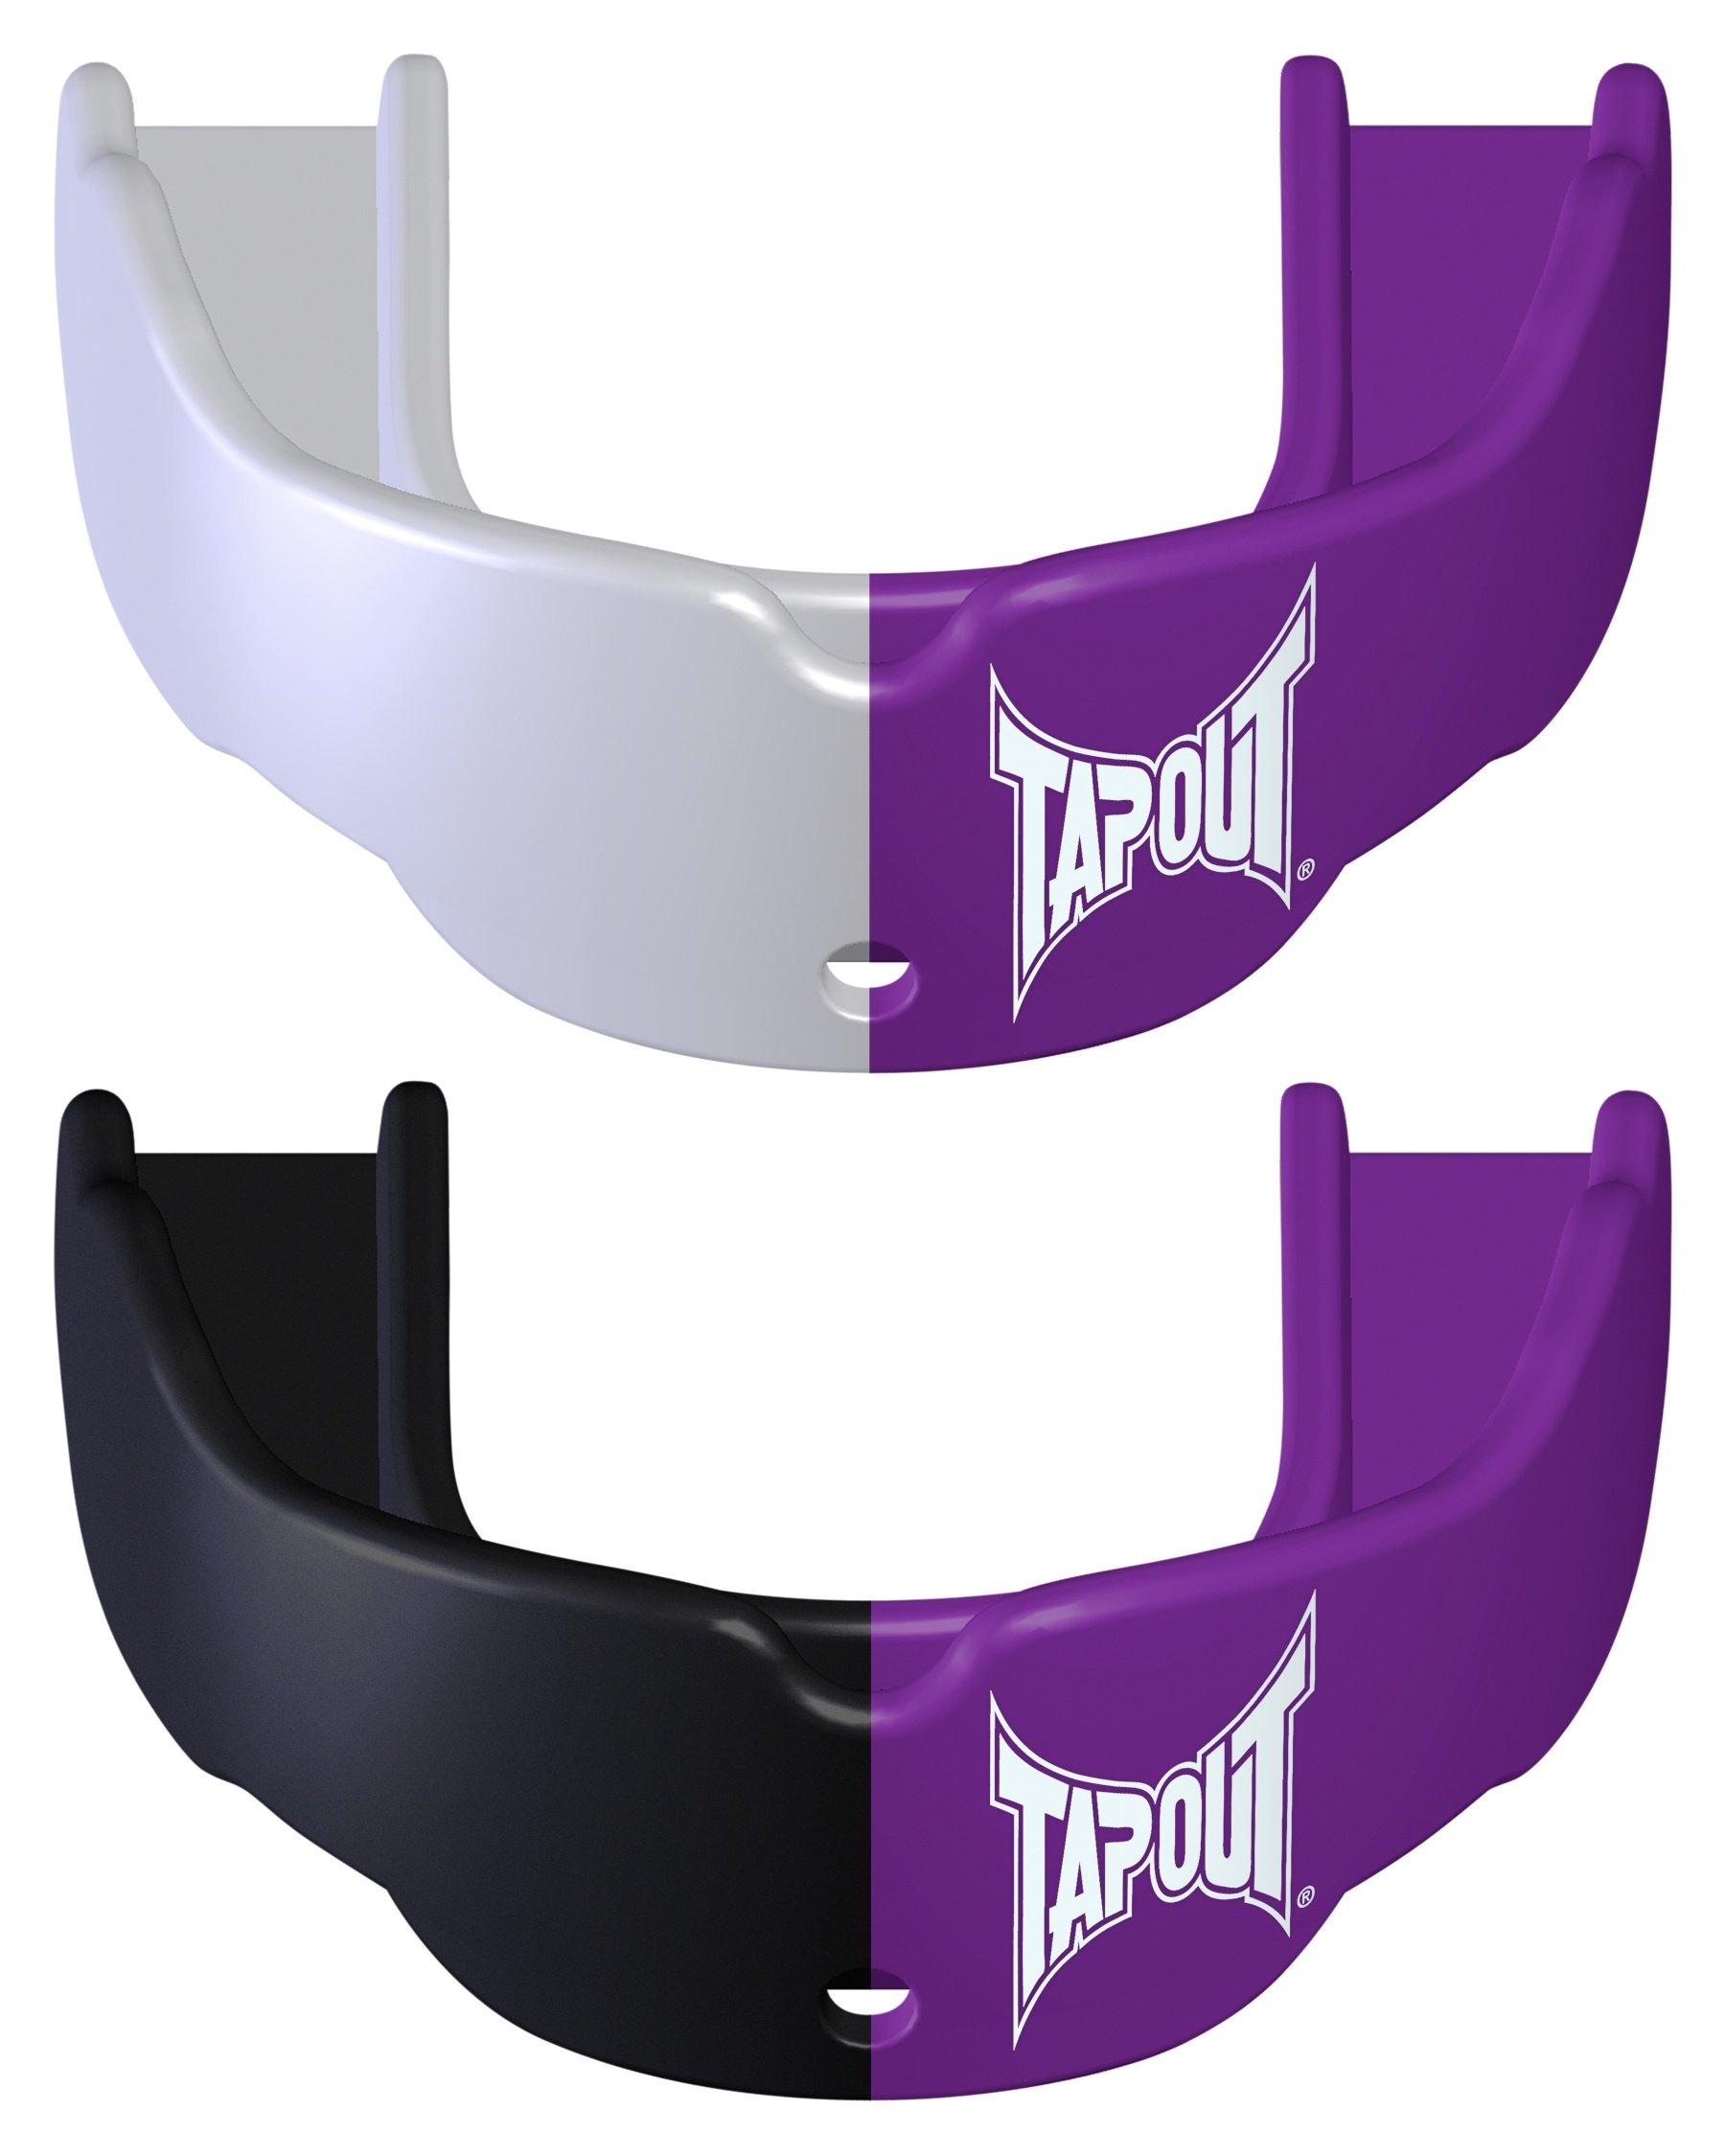 Tapout - Paradenti, 2 pezzi